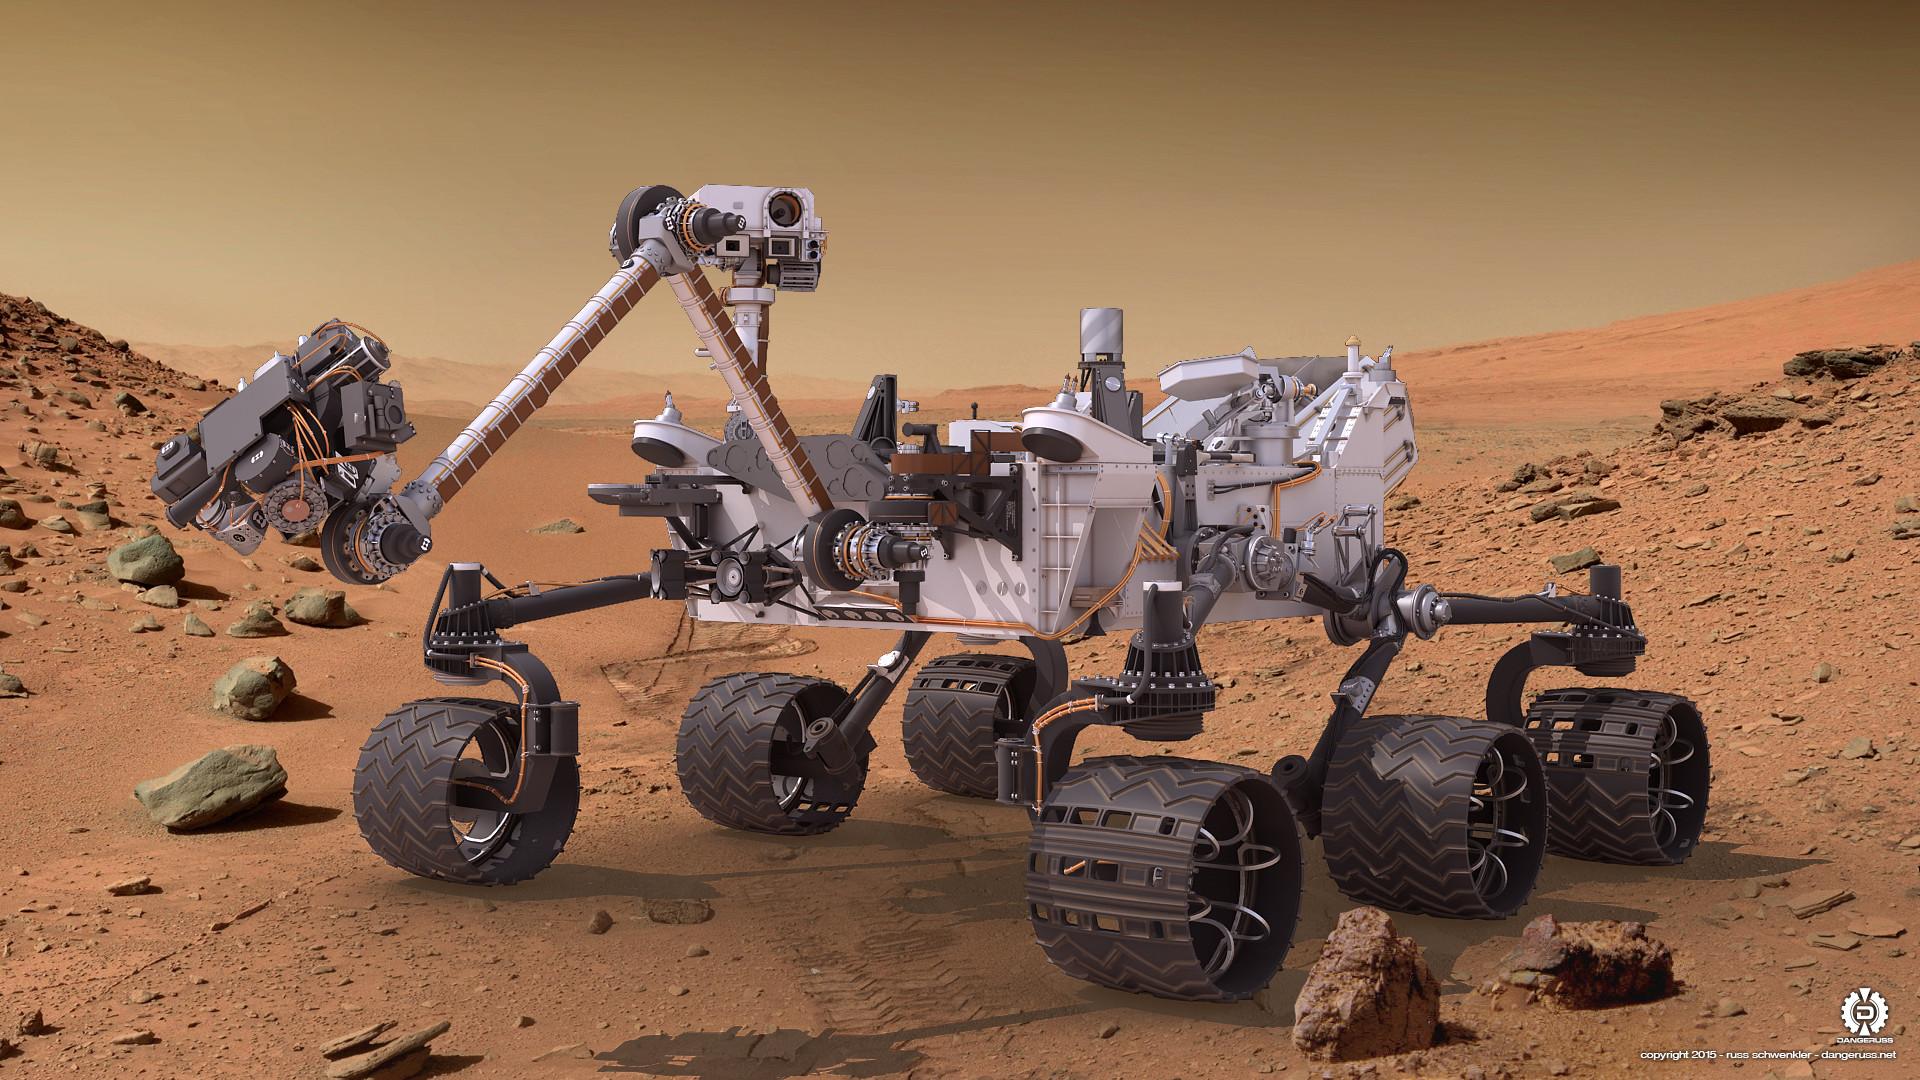 nasa explorer mars - 1000×650